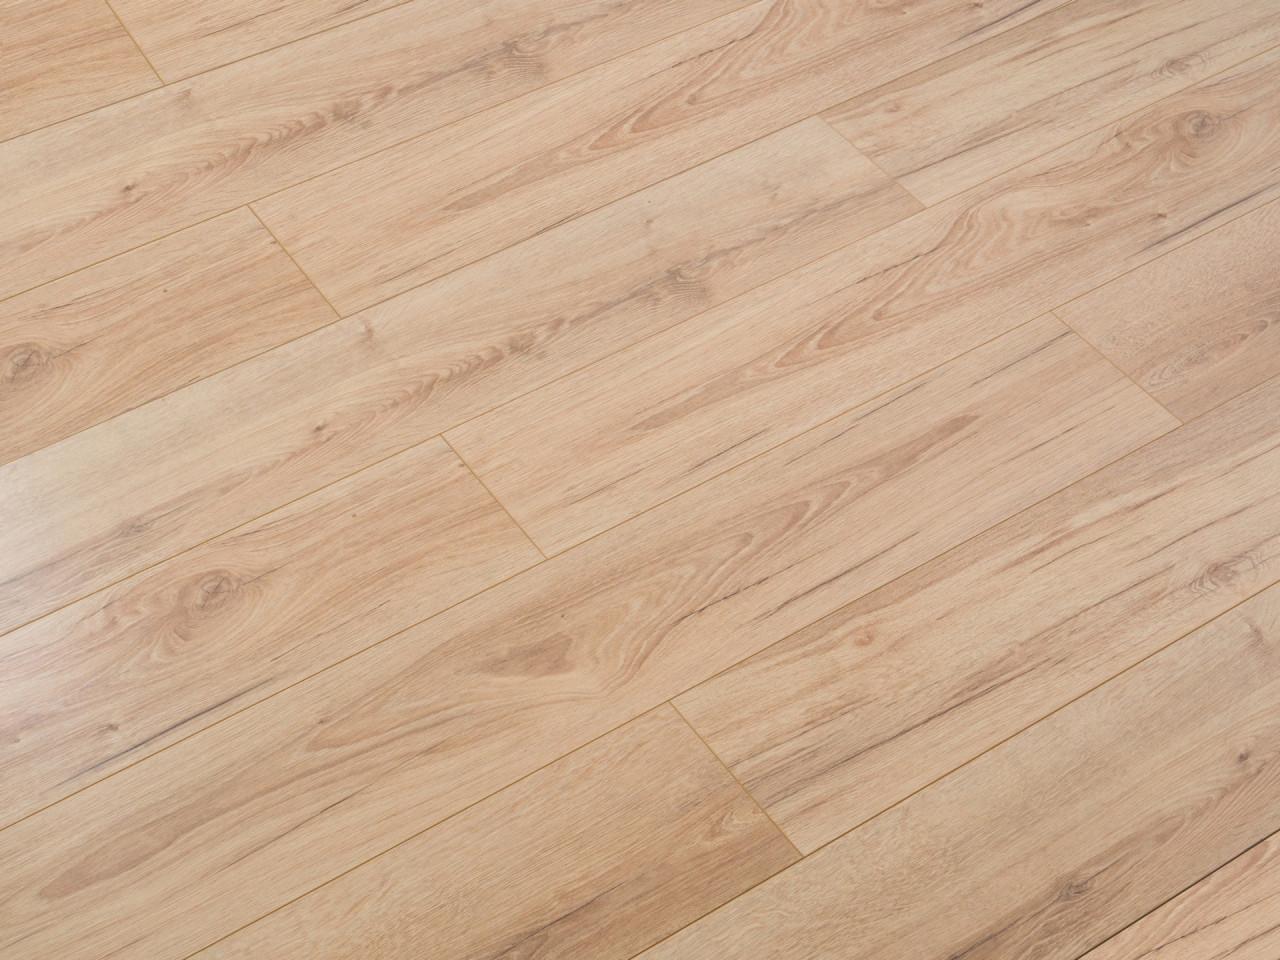 K419 Armoury Oak (sample)